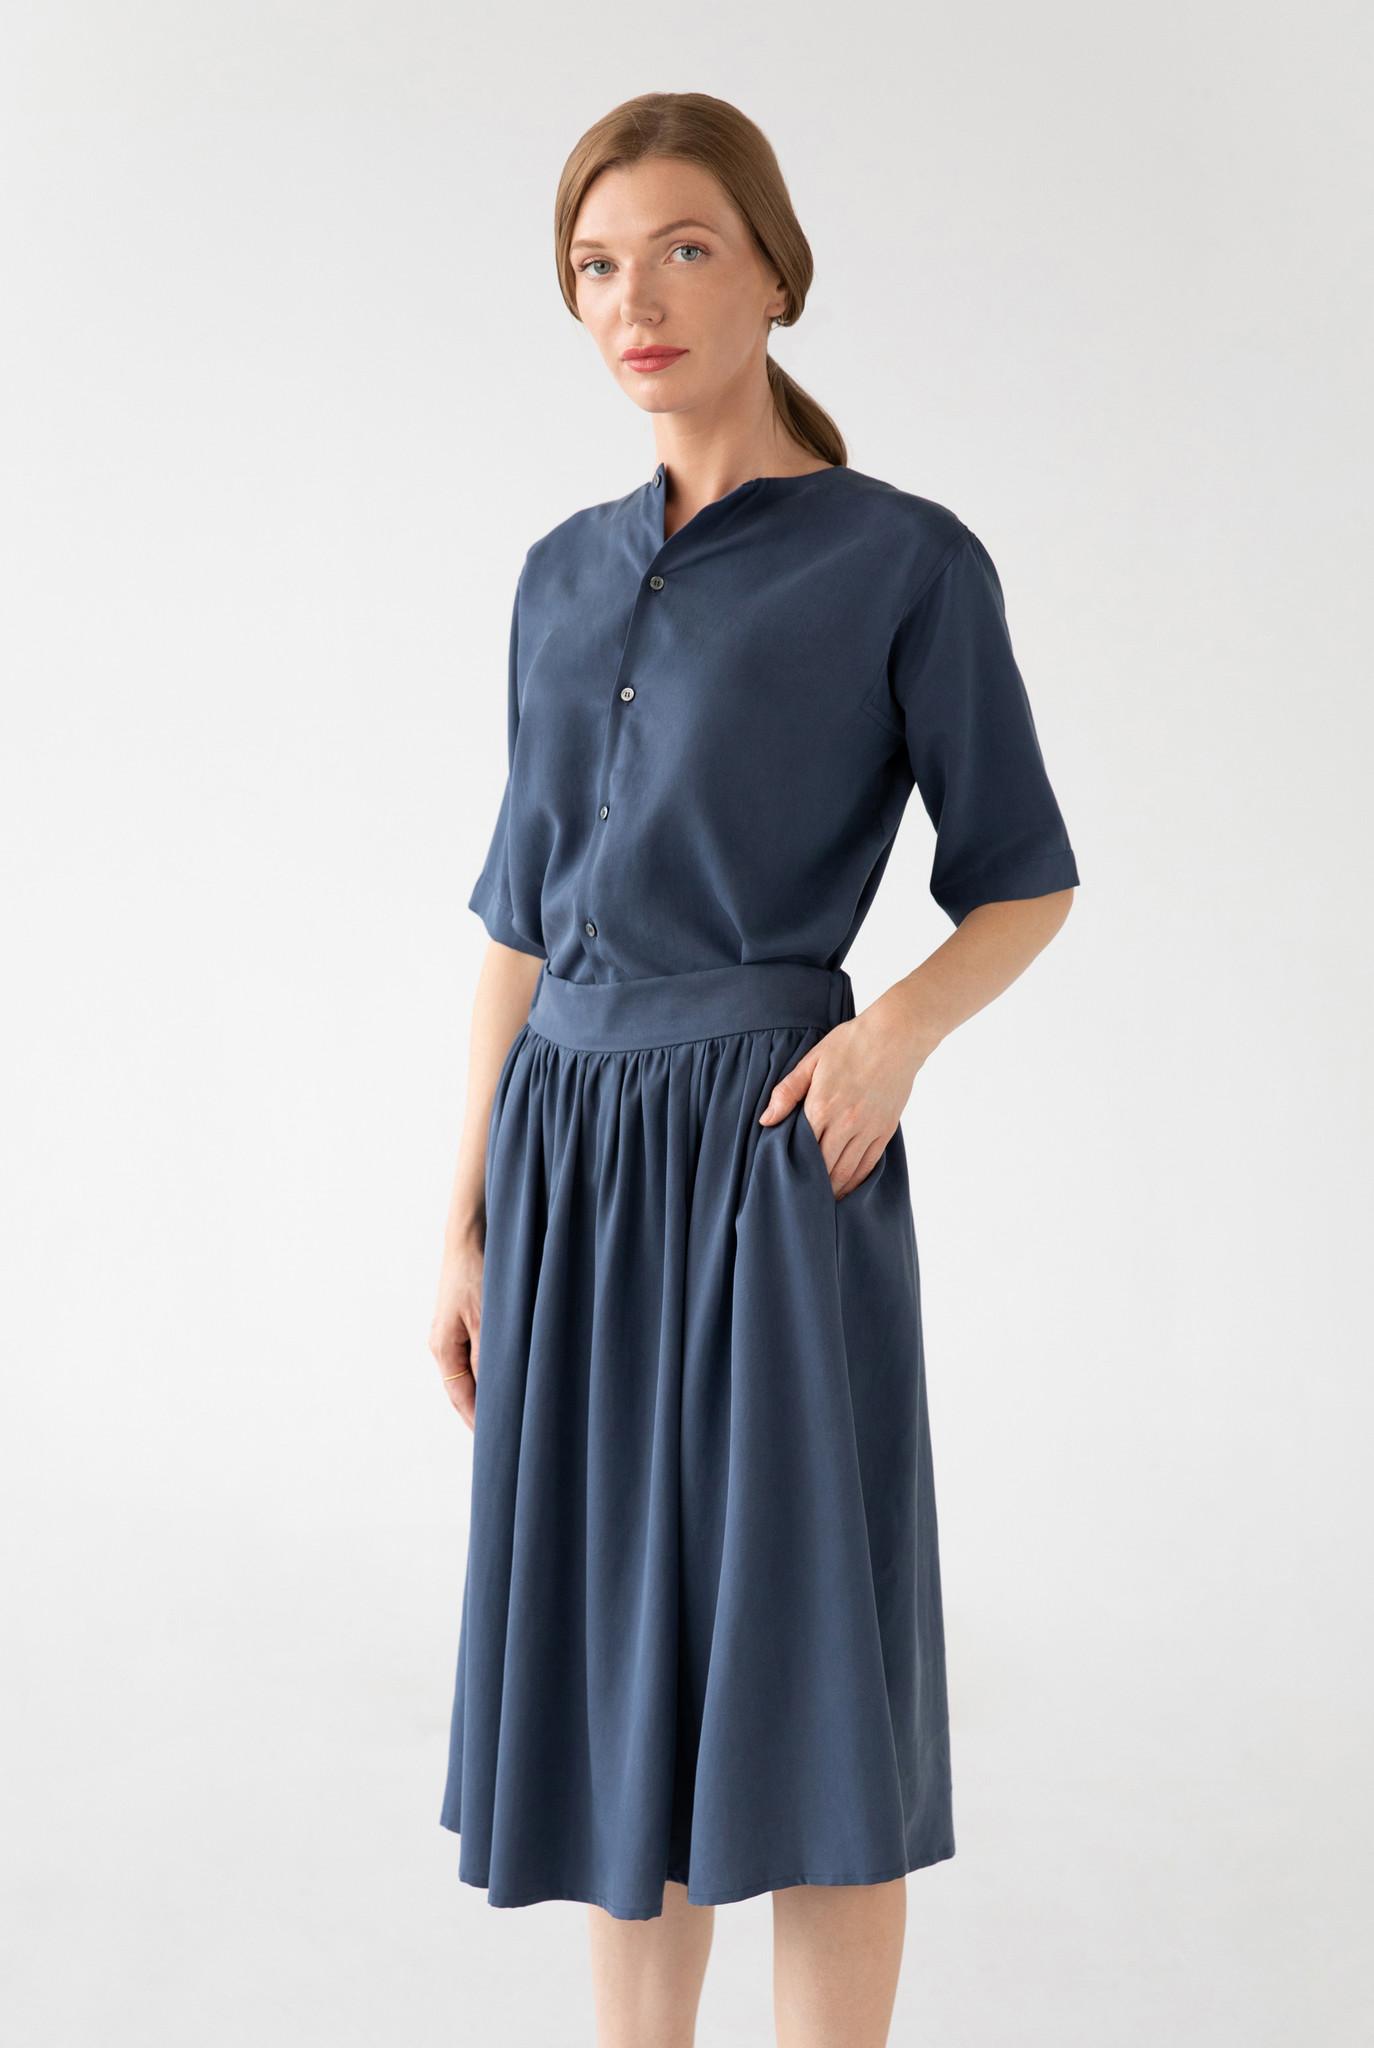 Bluse mit kurzem Arm aus Tencel - Blau-6